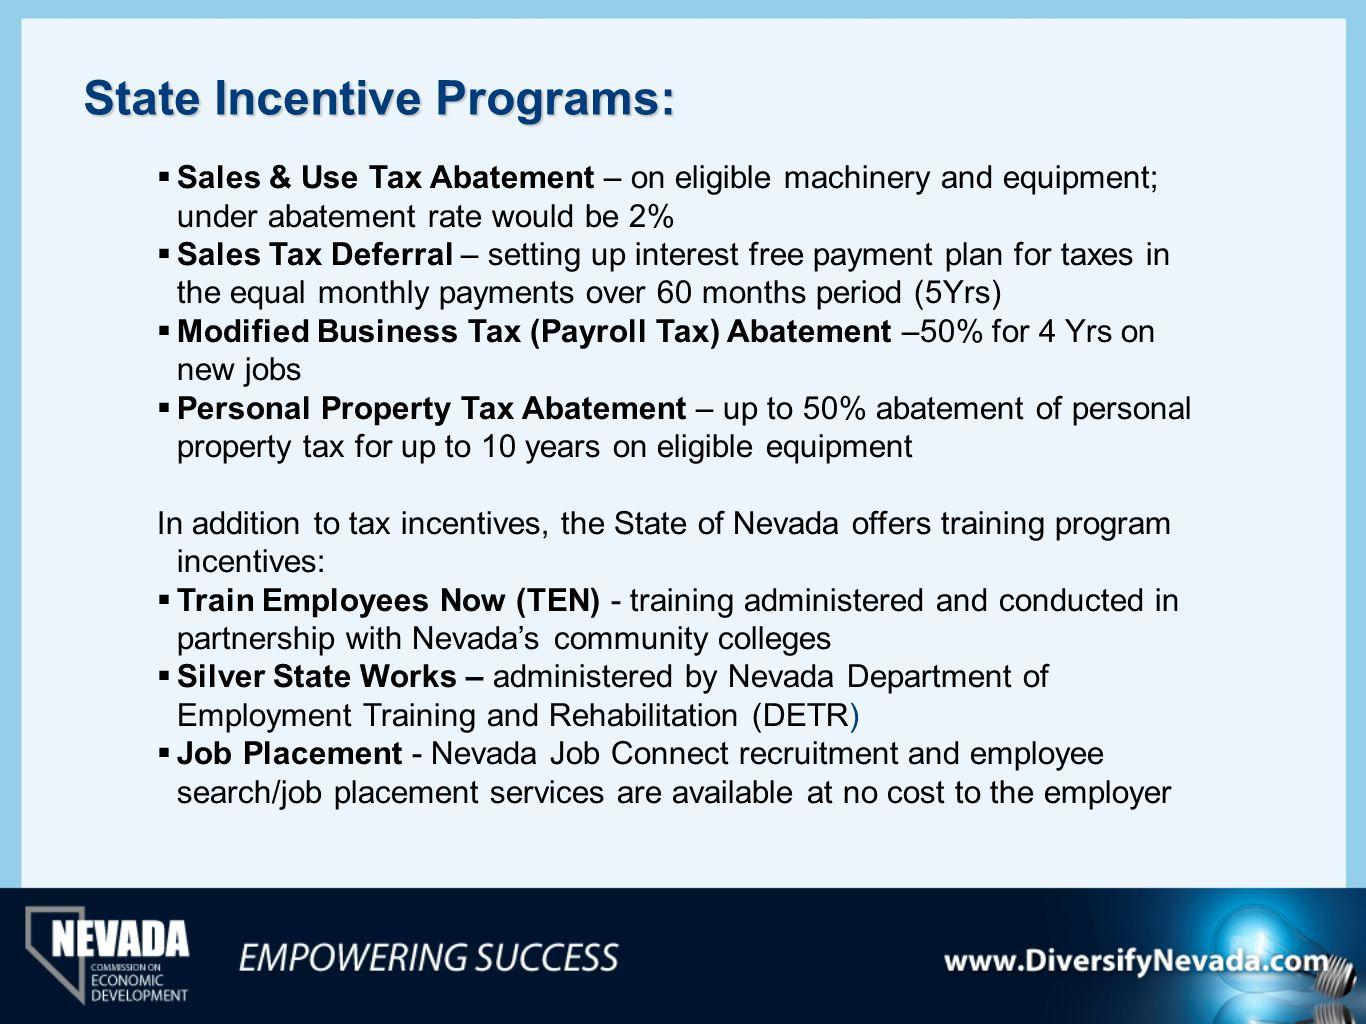 State Incentive Programs: